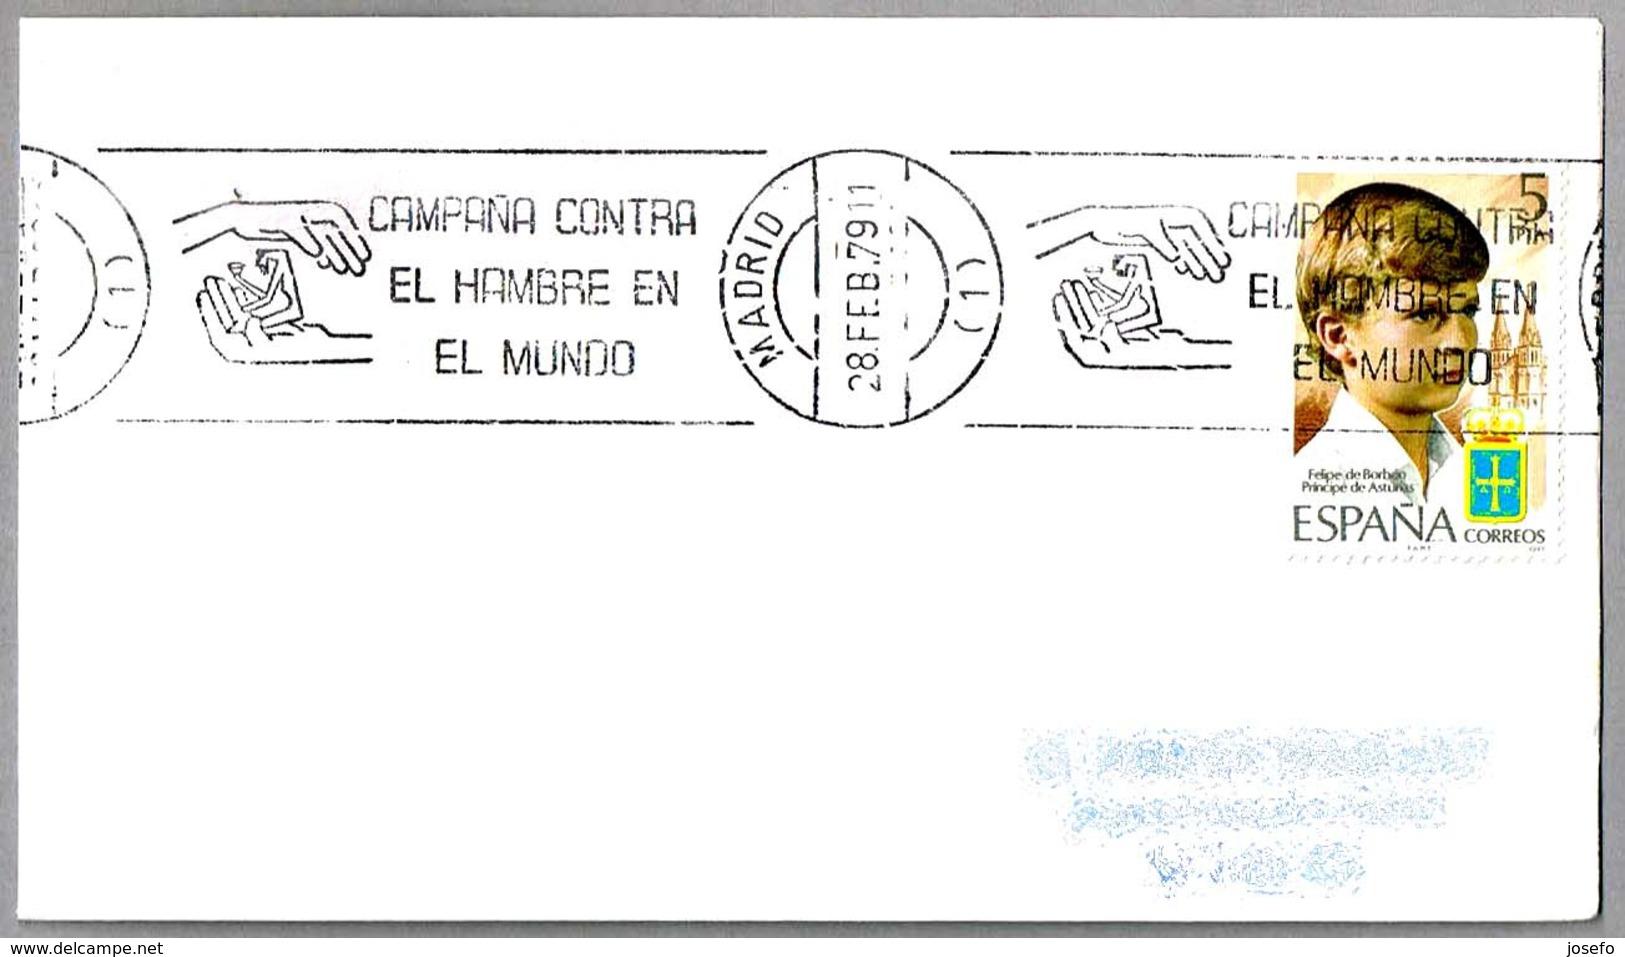 CAMPAÑA CONTRA EN HAMBRE EN EL MUNDO - Campaign Against Hunger In The World. Madrid 1979 - Against Starve